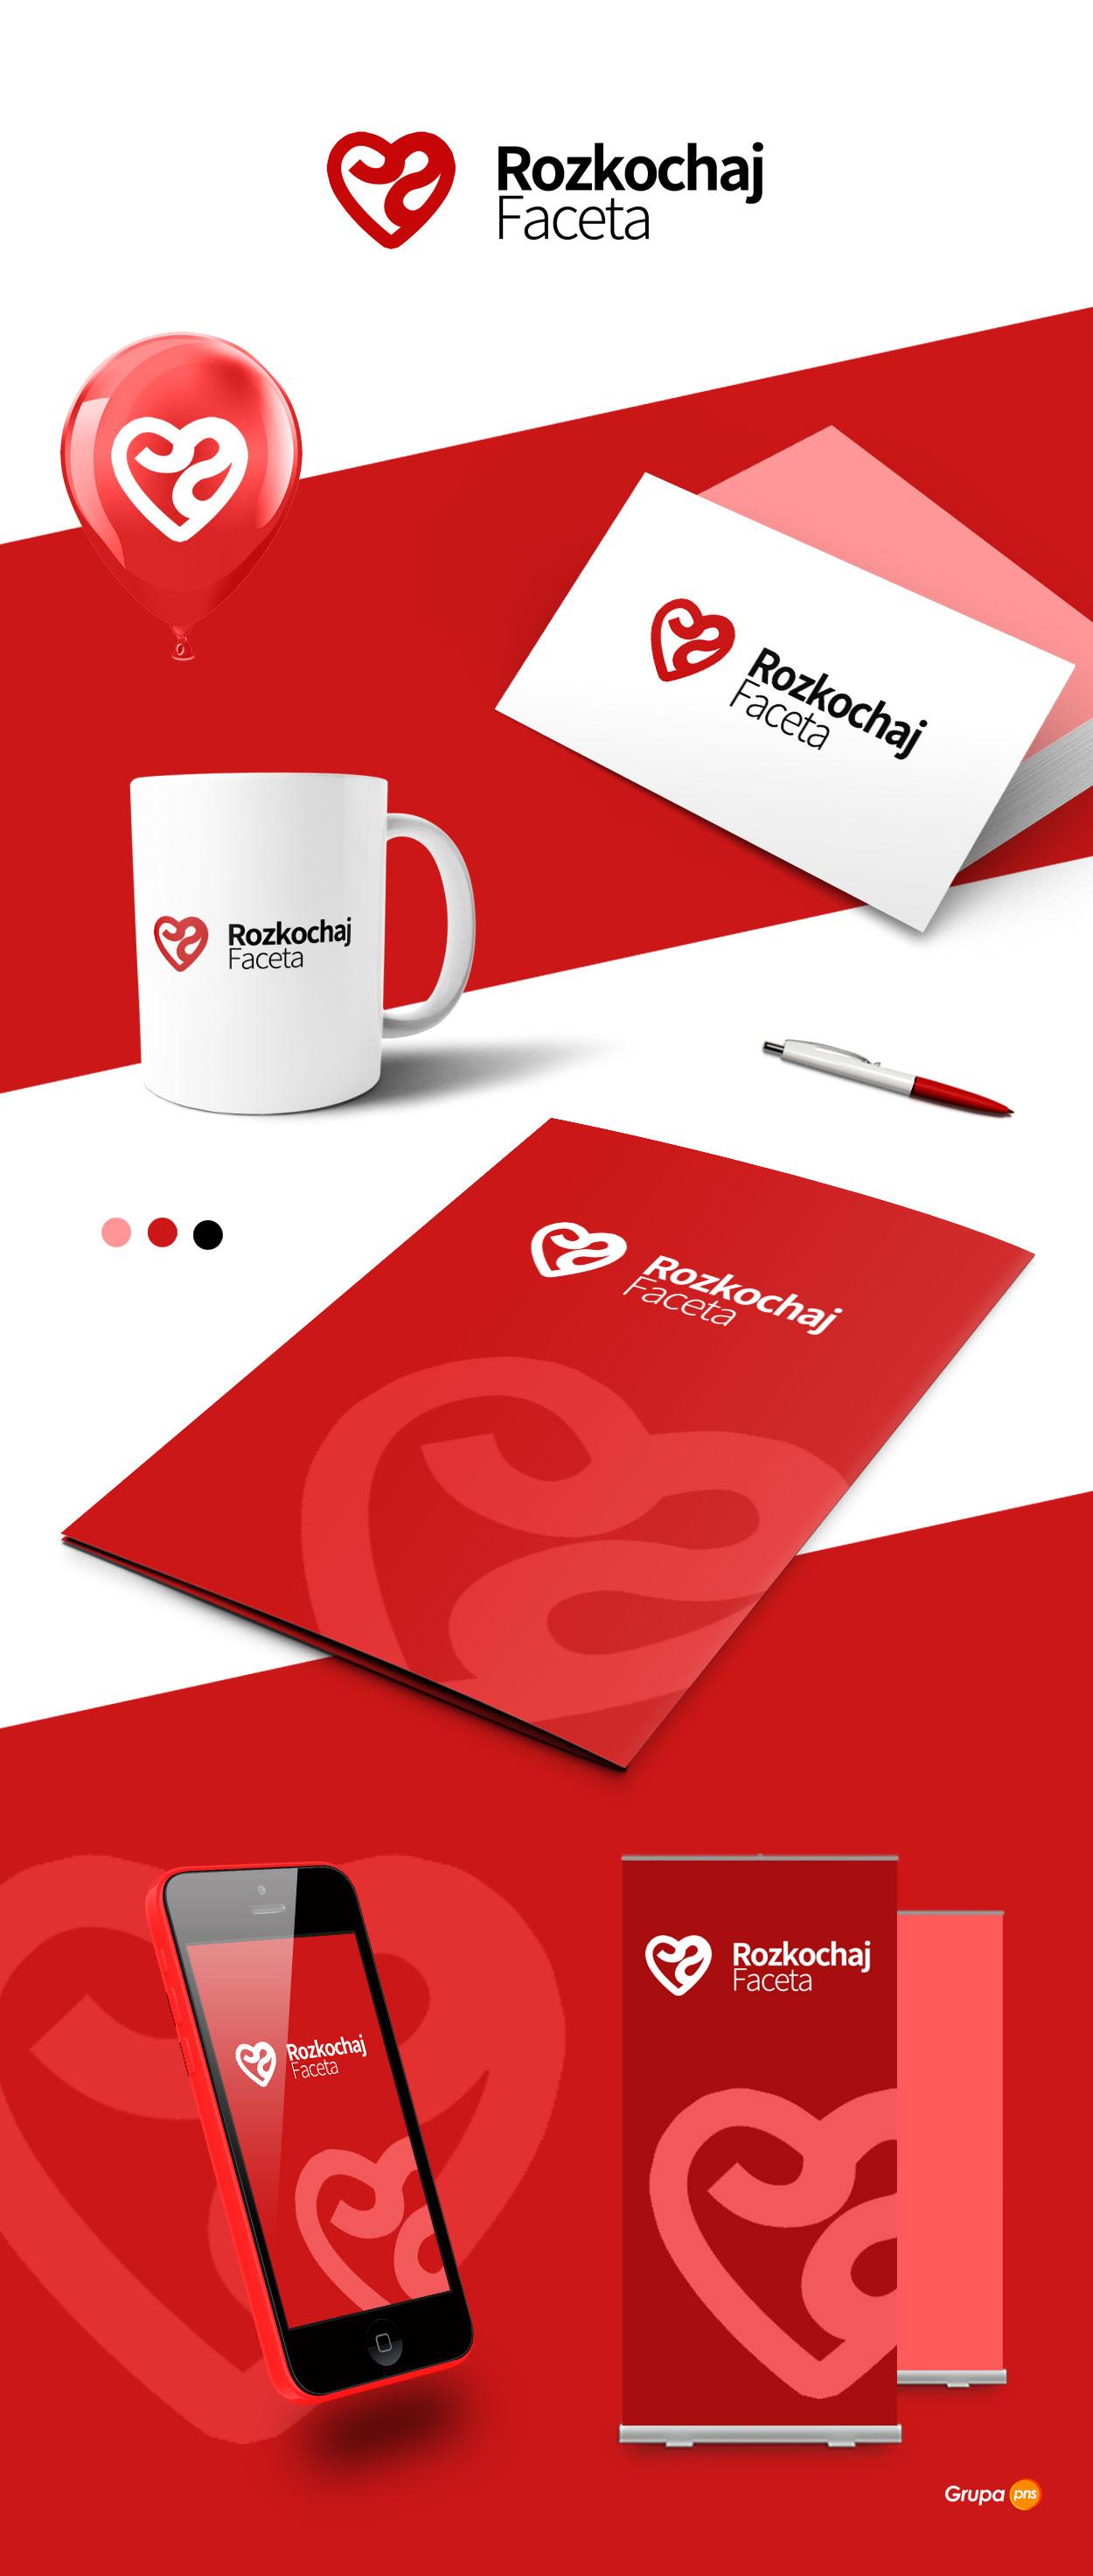 logo-dla-firmy-produktu-rozkochaj-faceta